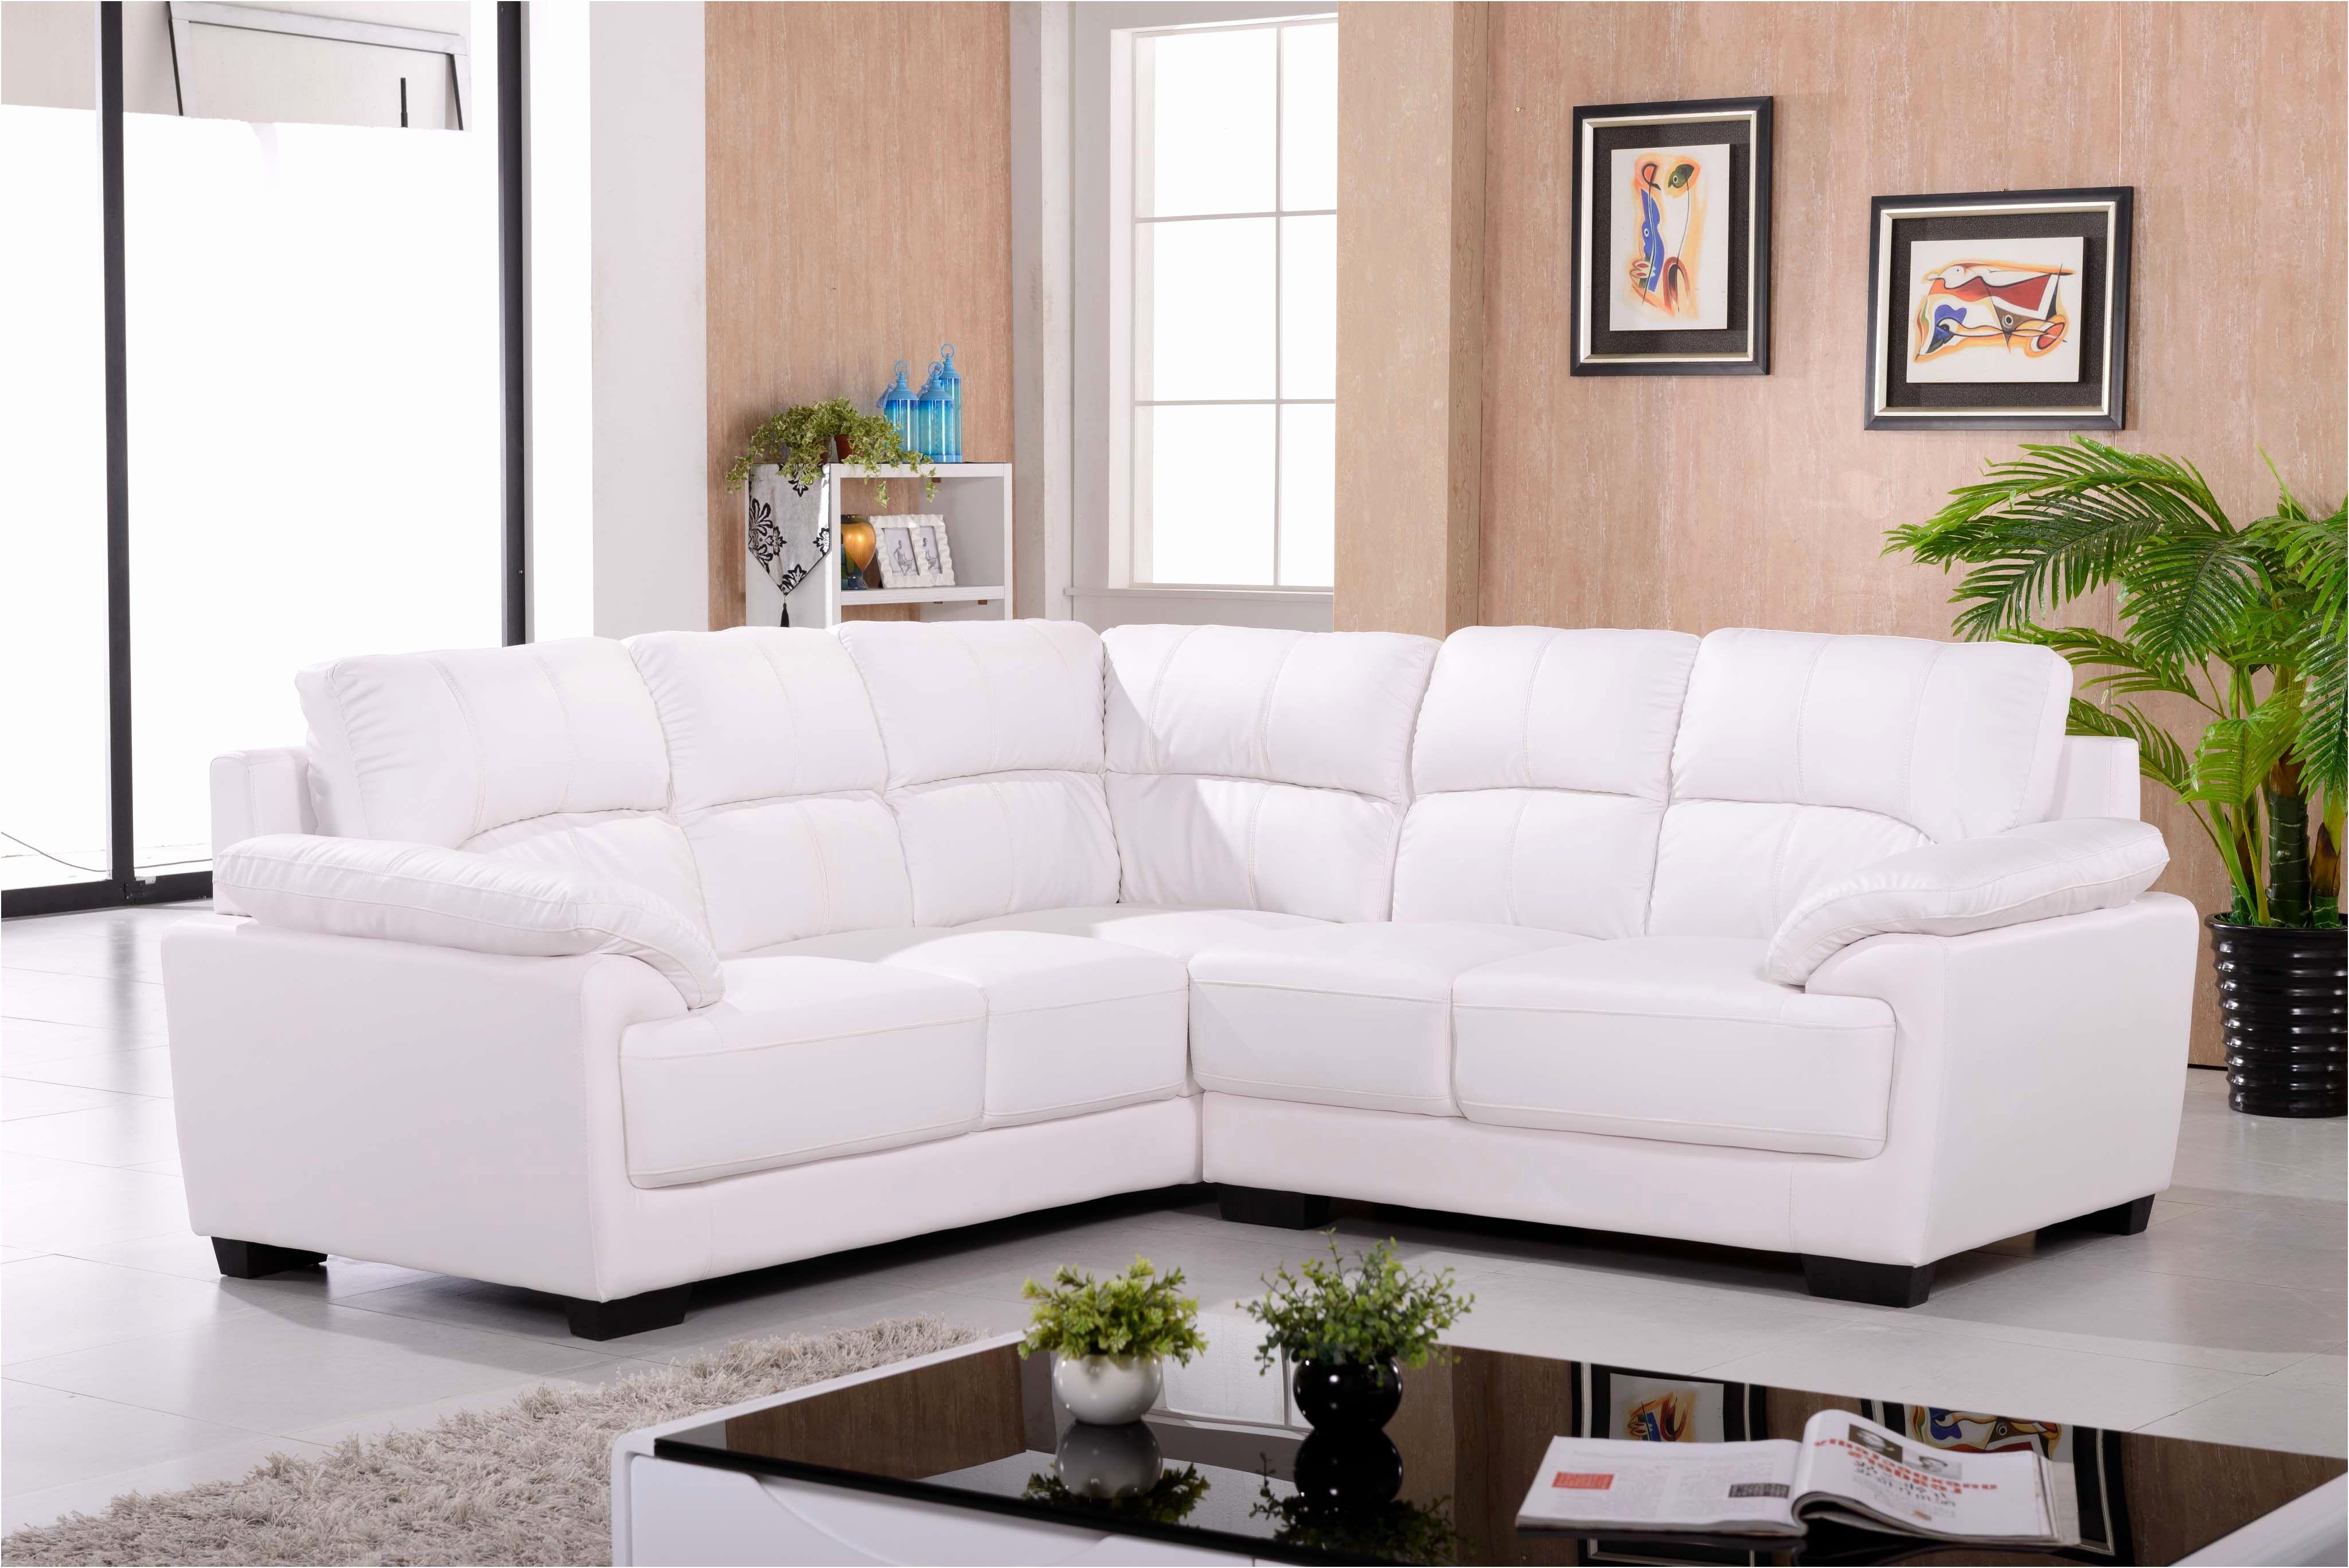 Elegant White Sectional Sofas Graphics White Sectional Sofas Beautiful Sofas Magnificent White Leather Love White Sectional Sofa Sectional Sofa White Sectional